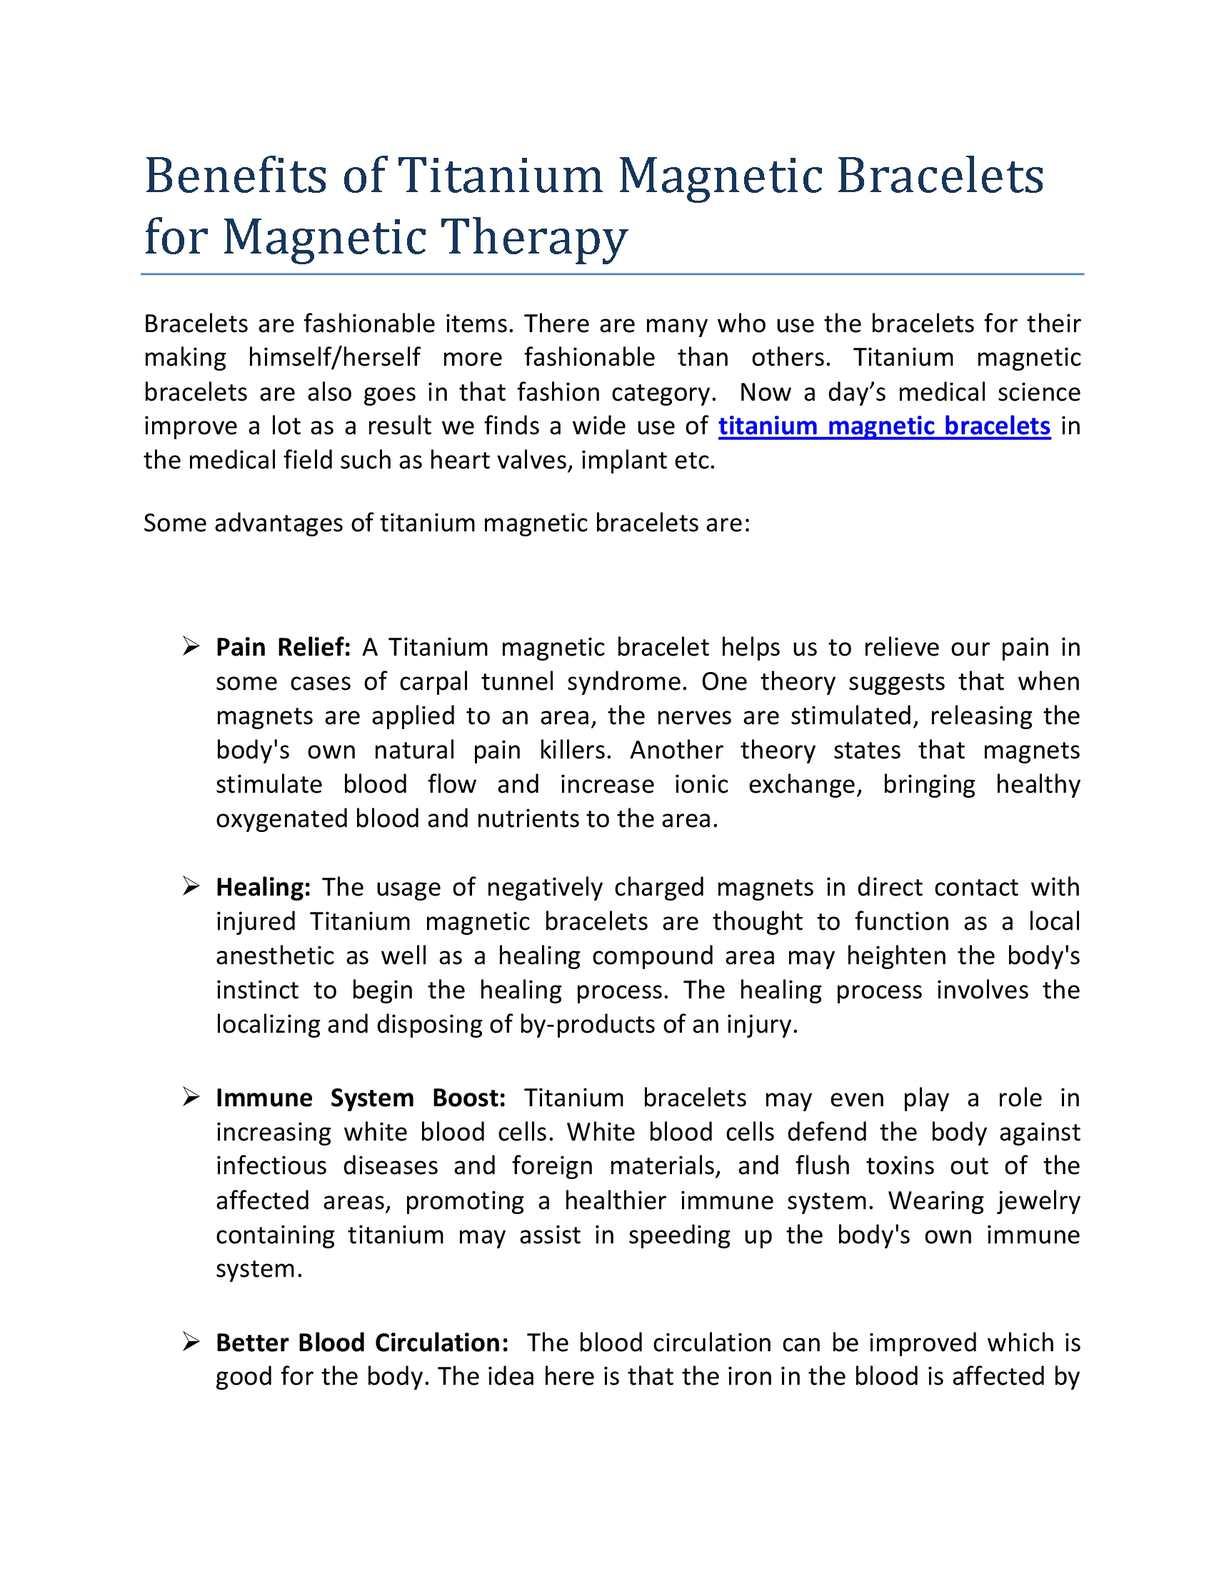 Calaméo - Benefits of Titanium Magnetic Bracelets for